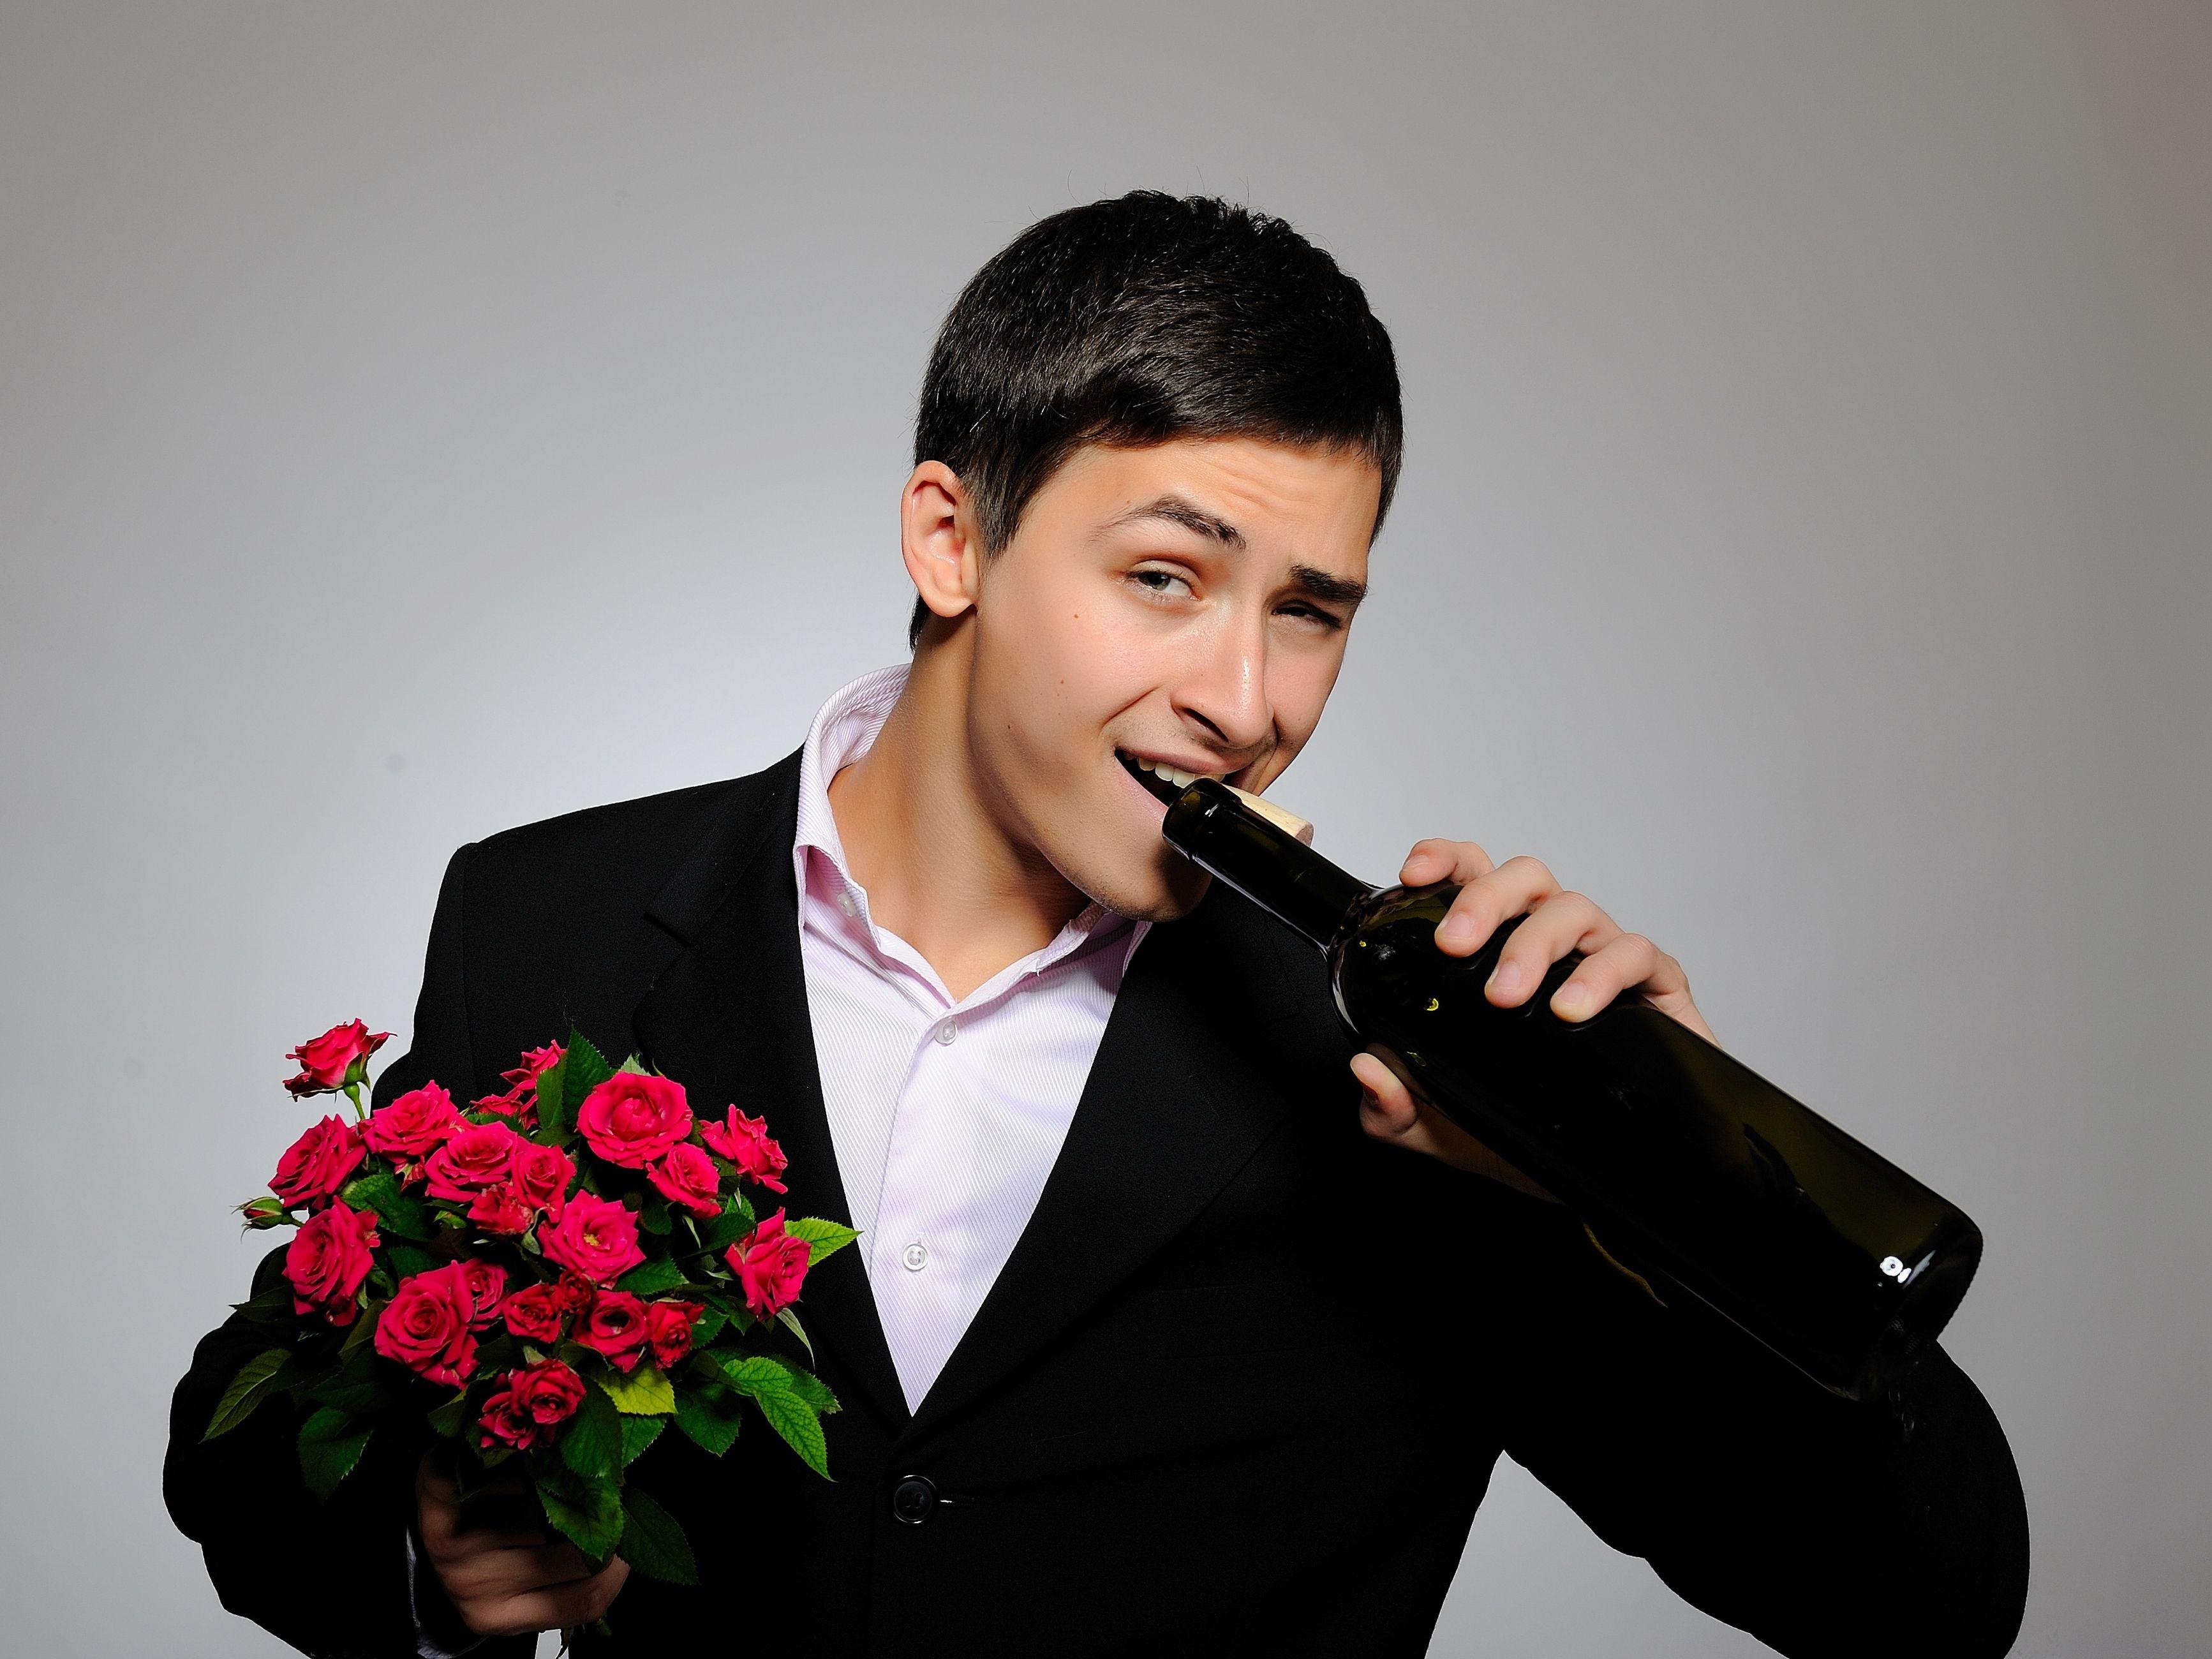 даже мужчина с розами картинки данном